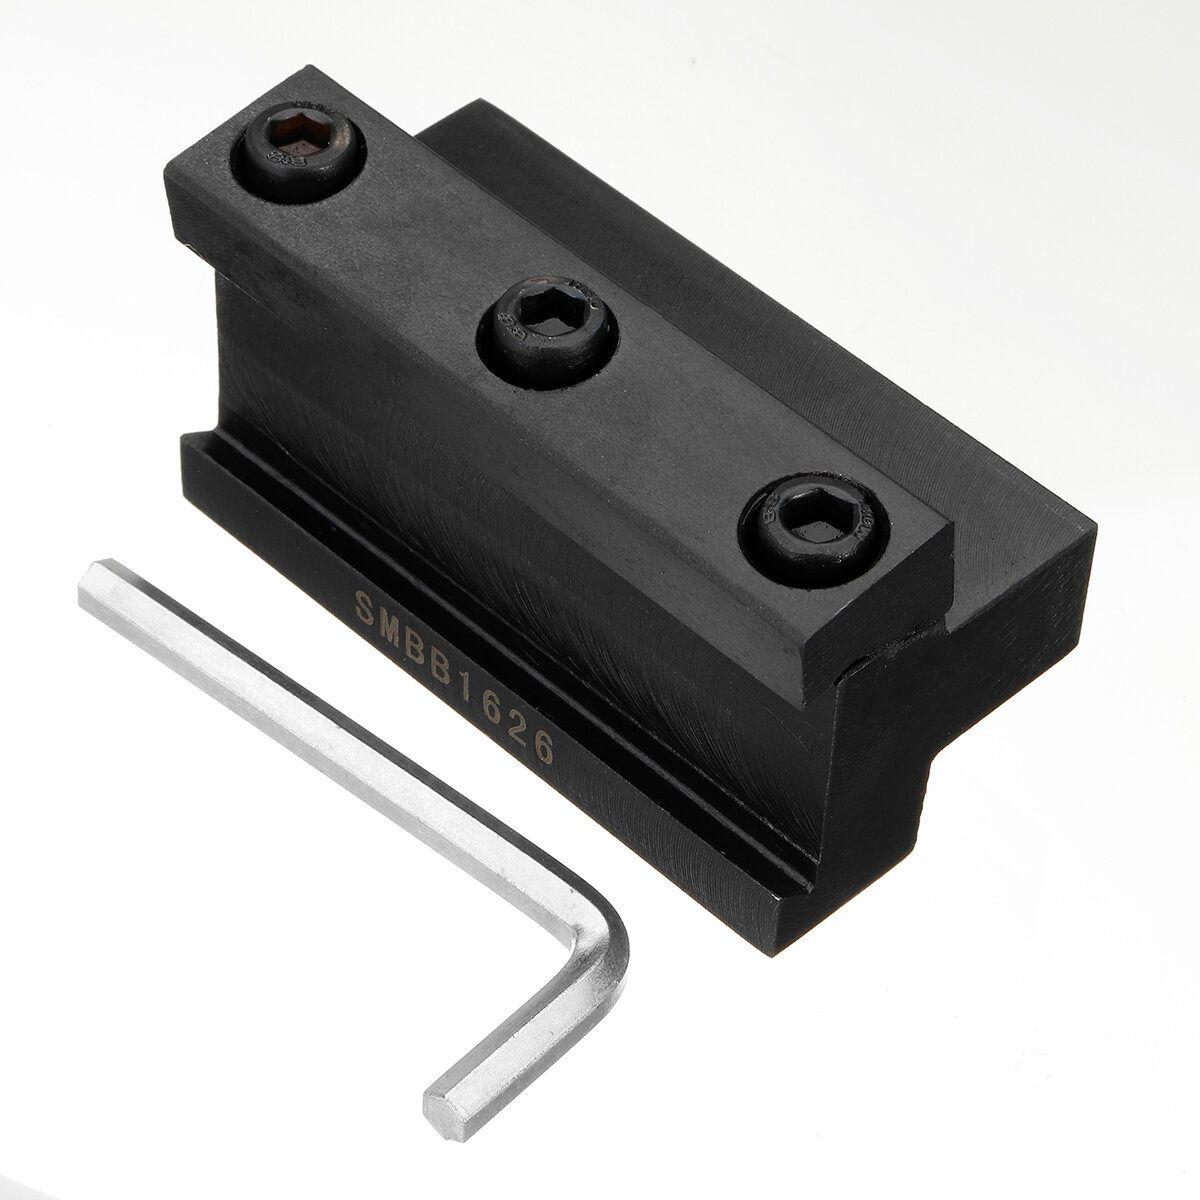 AXB US$27.79 SMBB1626 Cutting Blade Holder For Cut-Off Cutter Part Off Blade Inserts For GTN-2 GTN-3 Turning Tool